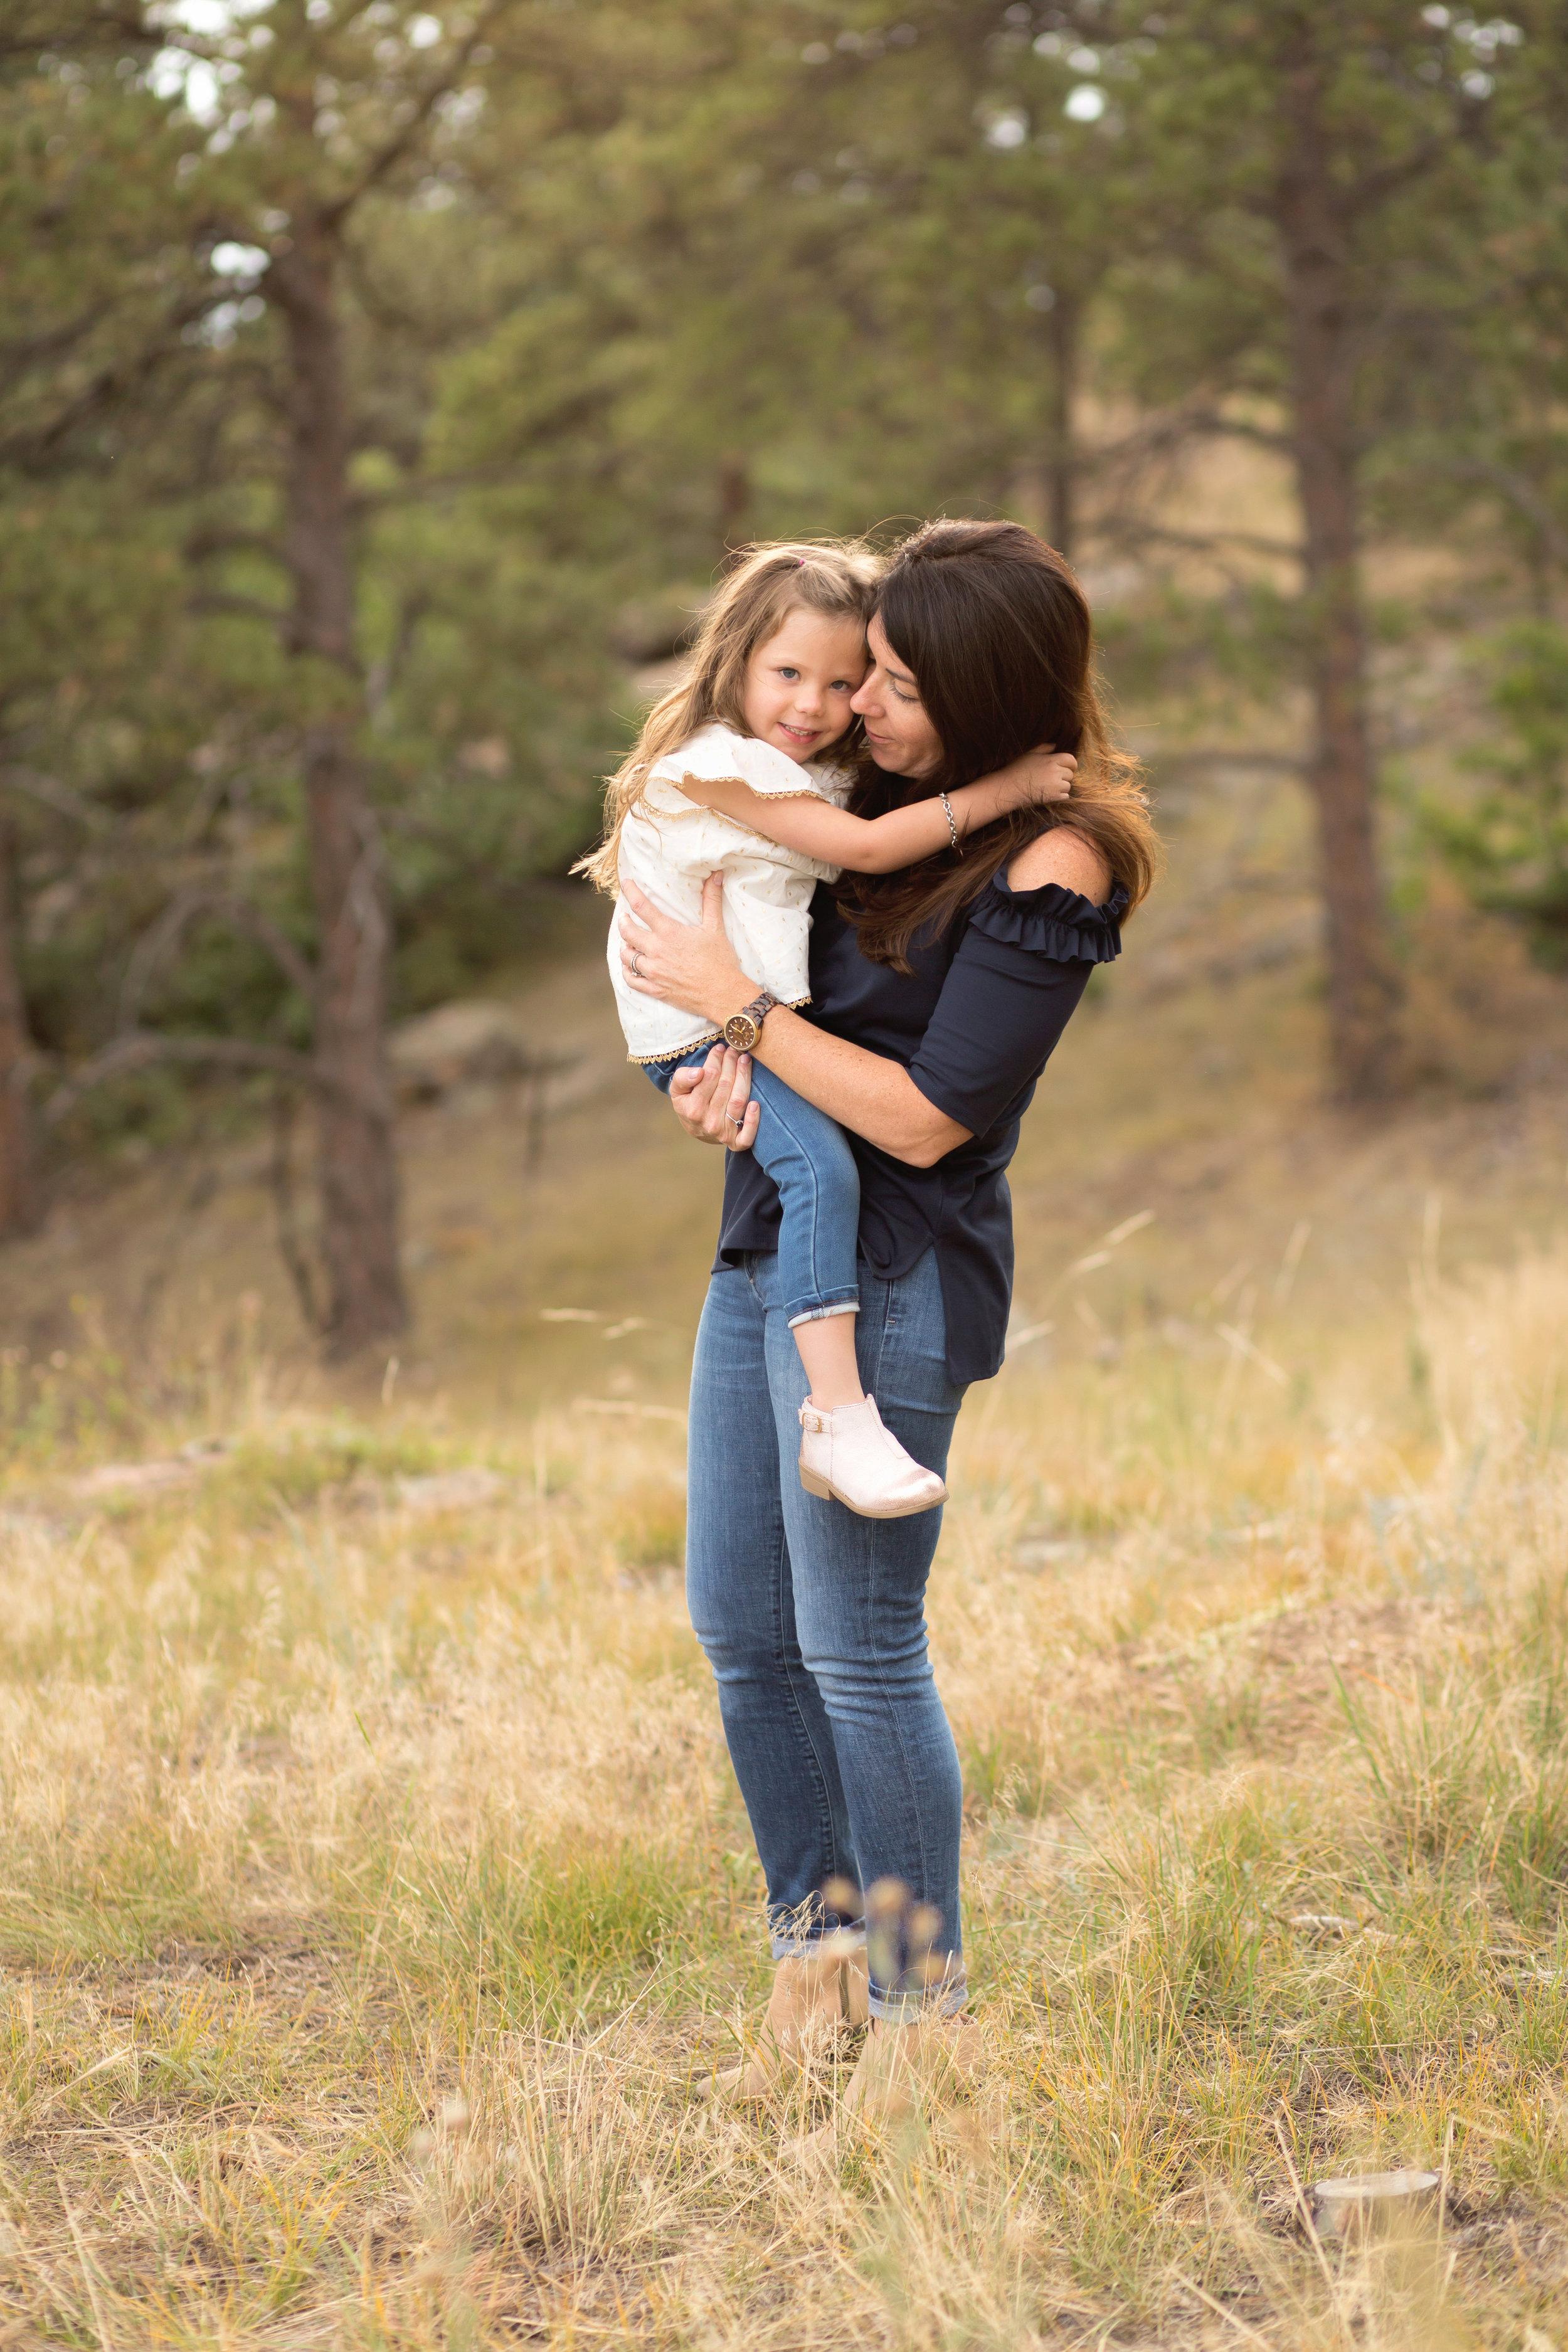 Denver Newborn Photographer, Denver Maternity Photographer, Boulder Newborn Photographer